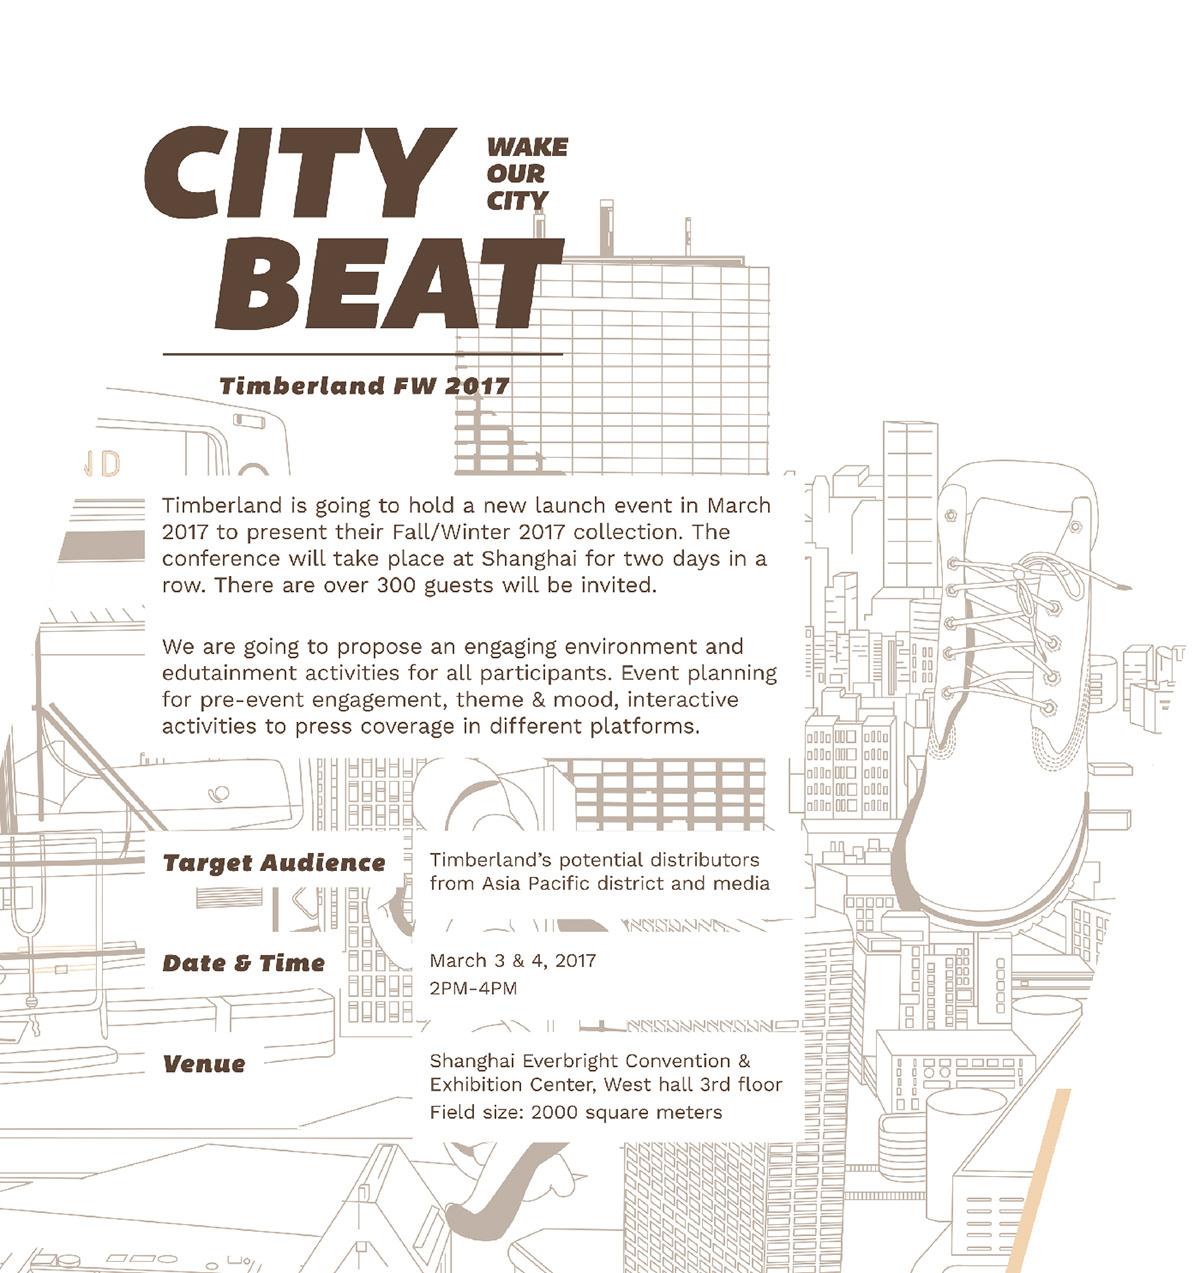 citybeat dating WD mijn Cloud hook up